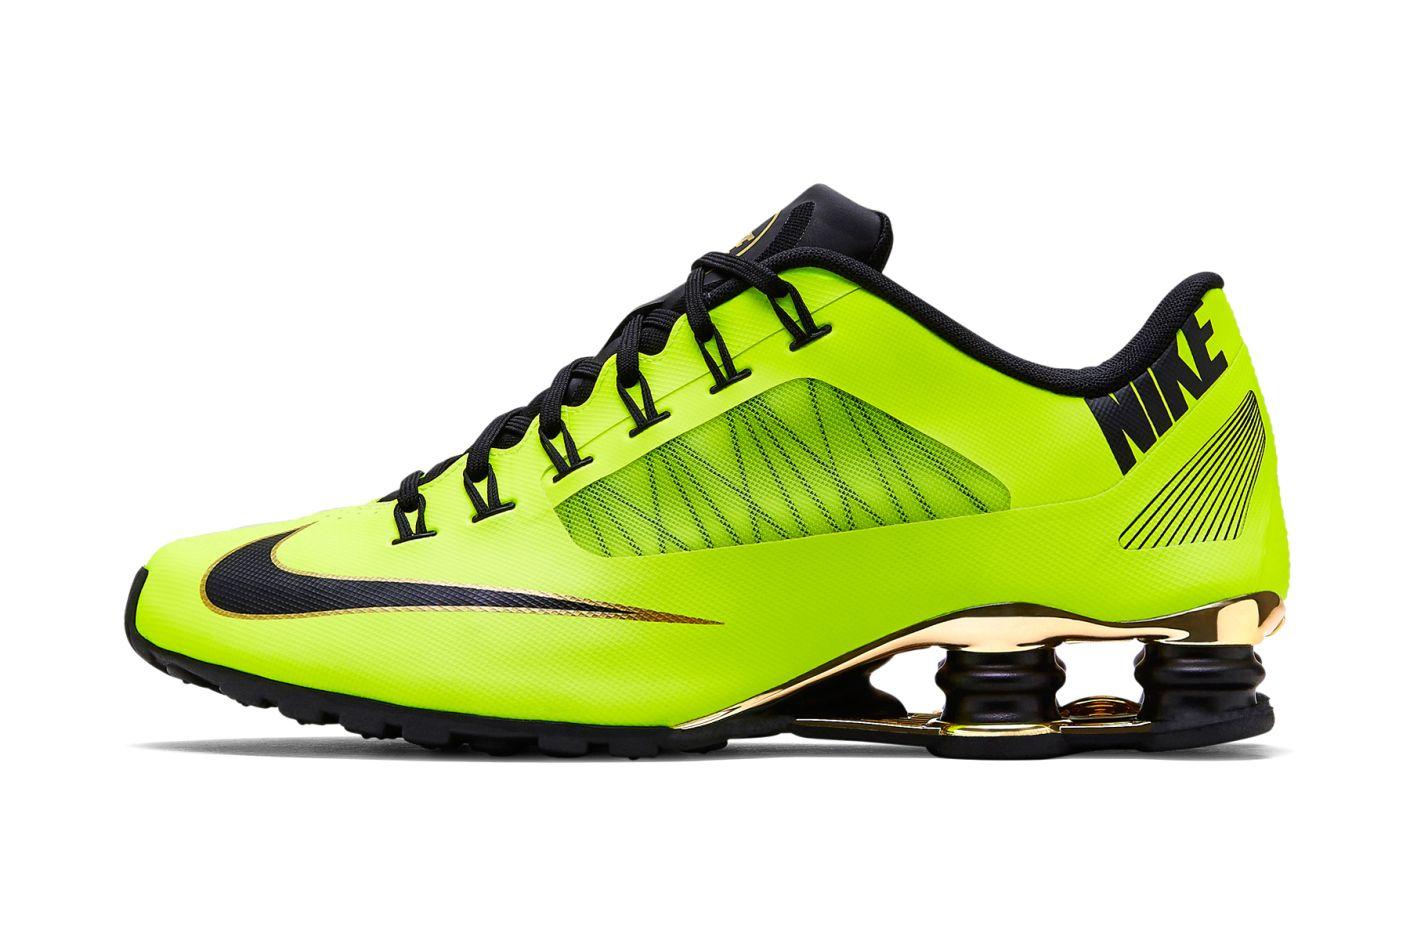 hot sale online bccac 7d58f ... spain nike sportswear pittsburgh steelers mens b3d4e 976d4